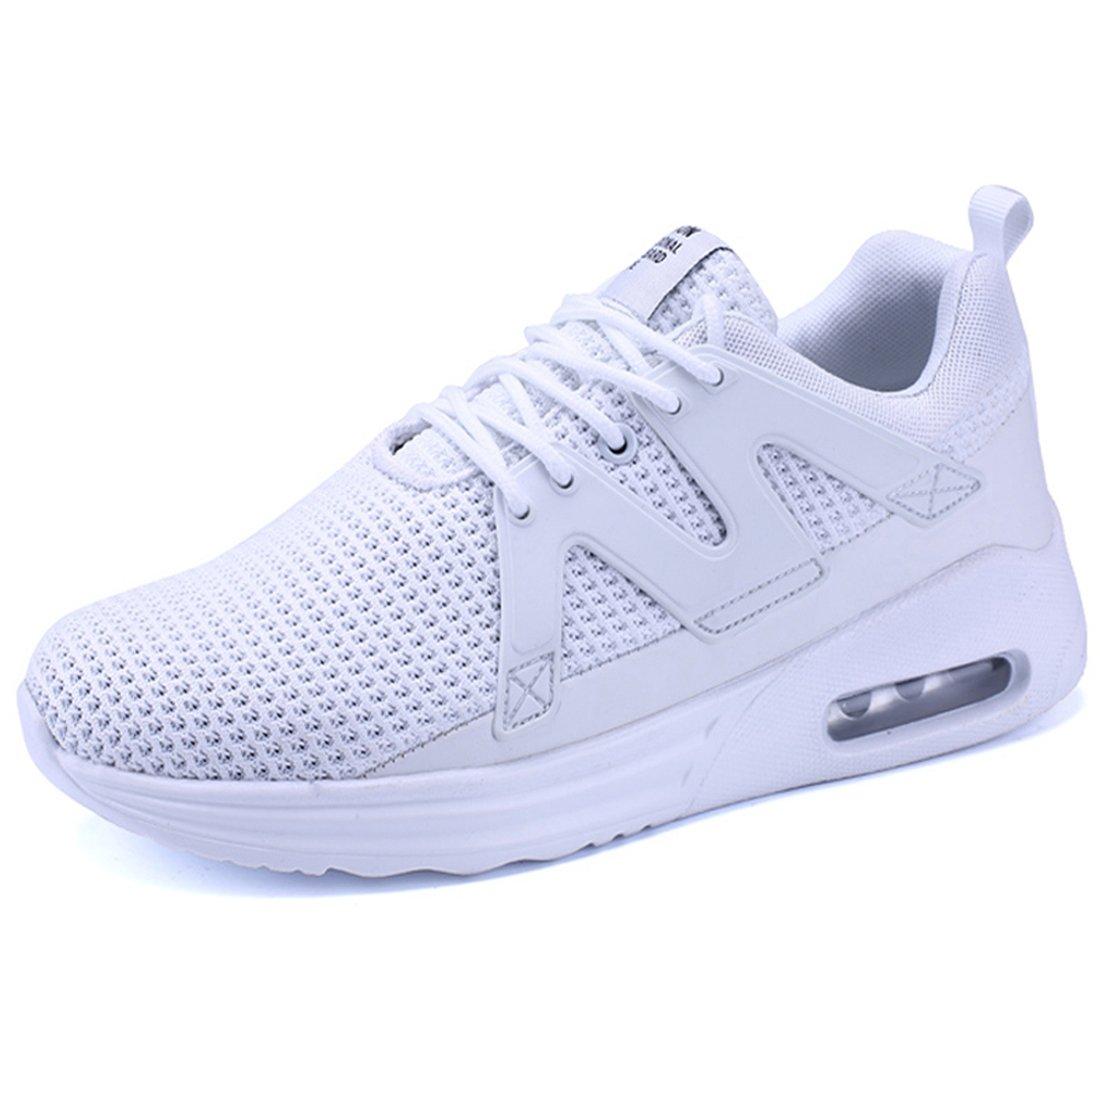 White1 9.5 D(M) US KRIMUS Mens Air Max shoes Red shoes for Men Sneakers Men Running shoes Men Sneakers Fashion(Black11)